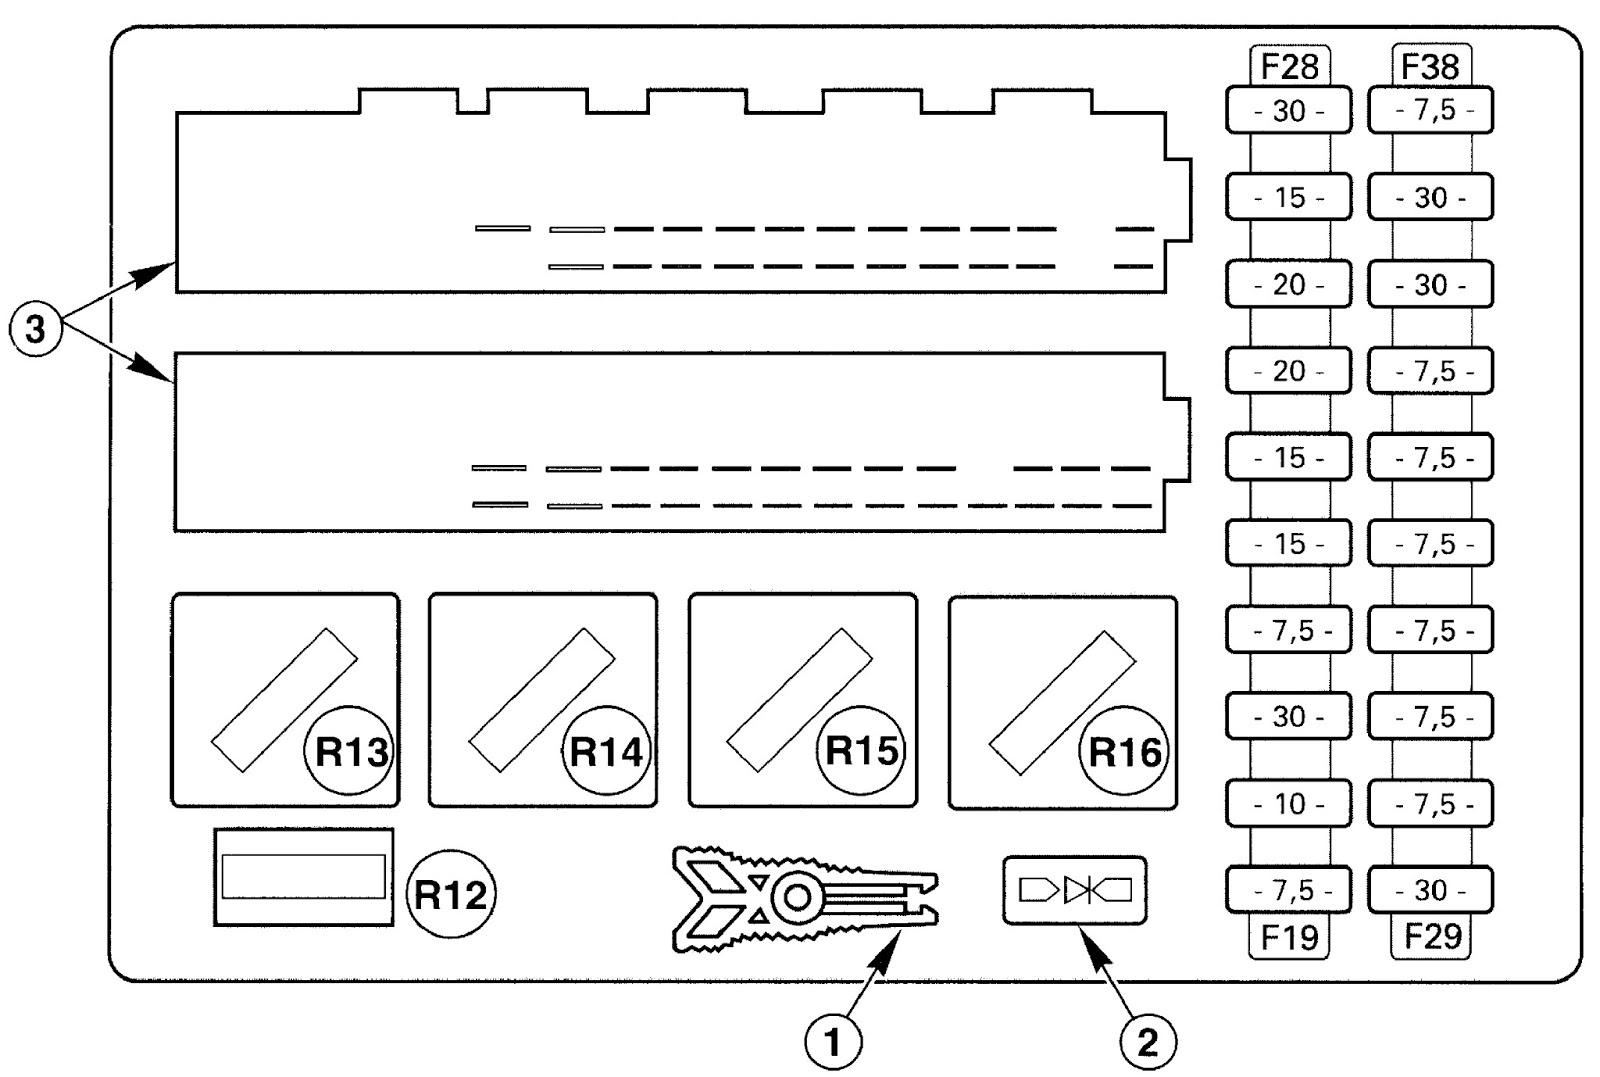 alternator wiring diagram ford transit images ford transit wiring wiring diagram 2011 ford transit connect